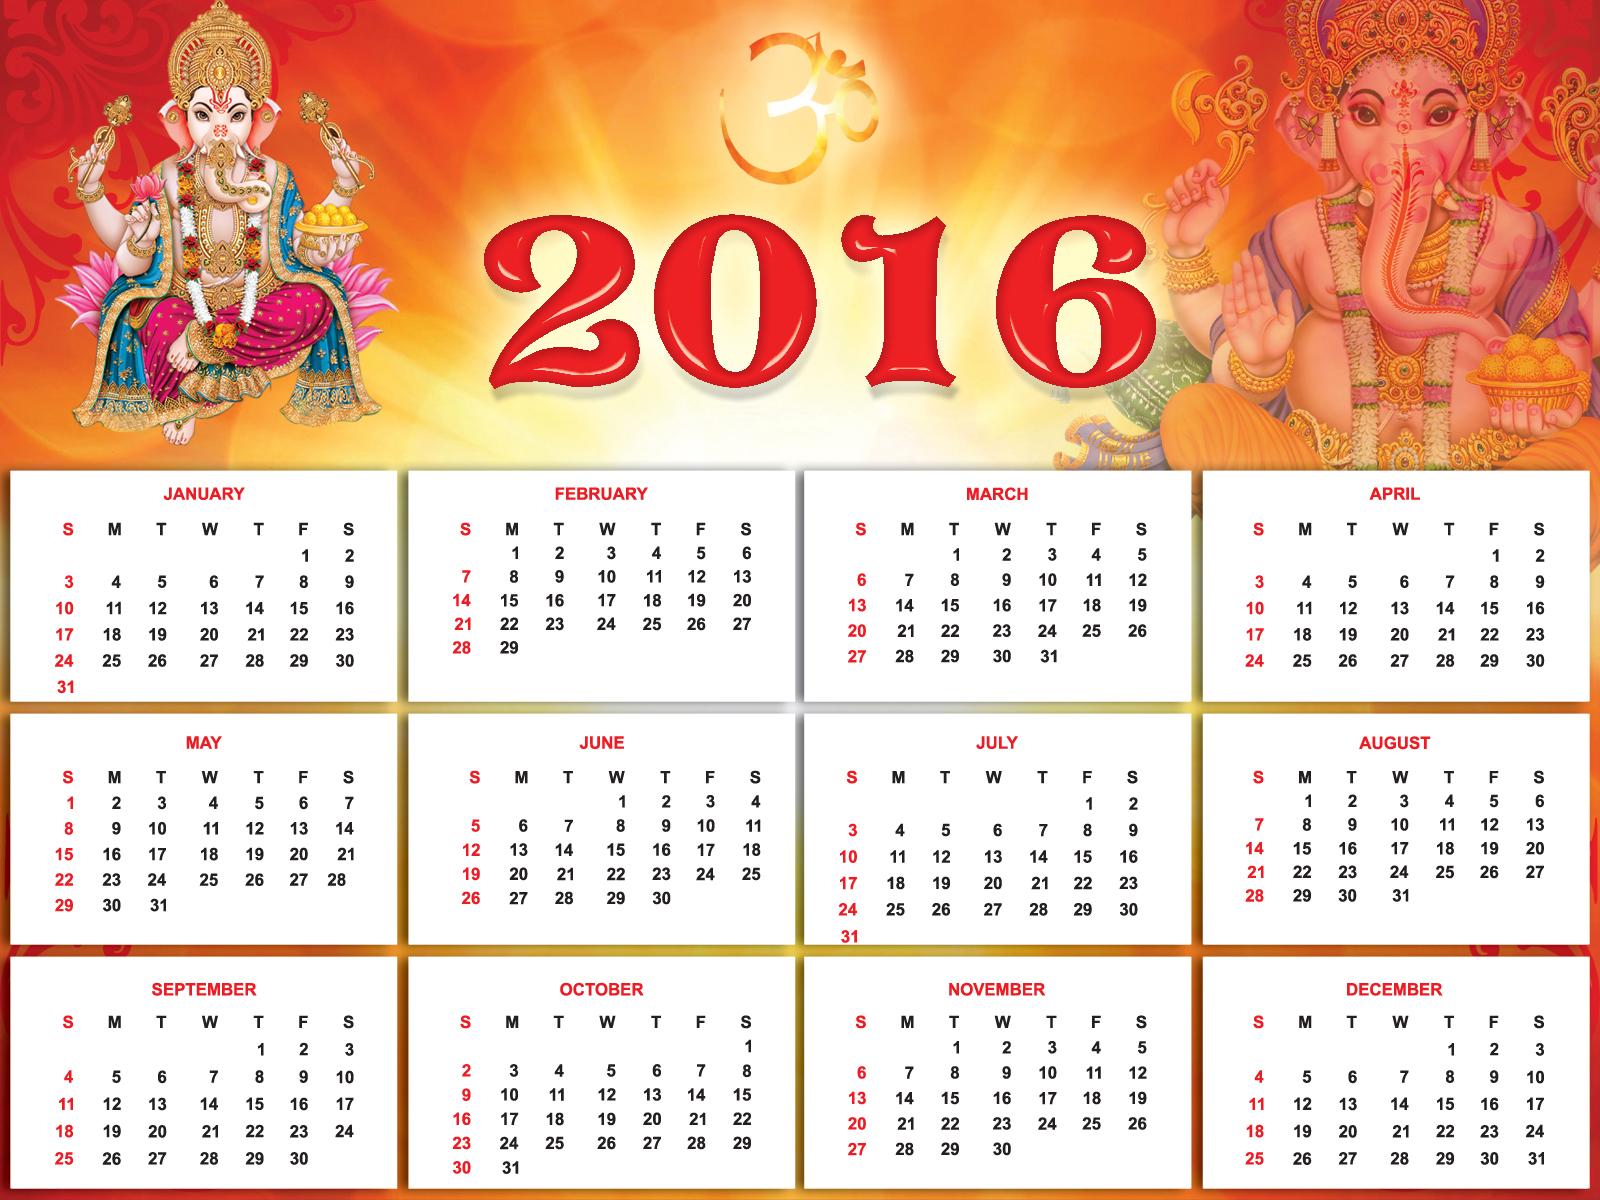 Calendar 2016 with God Ganesha Wallpaper   BhaktiSangrah 1600x1200